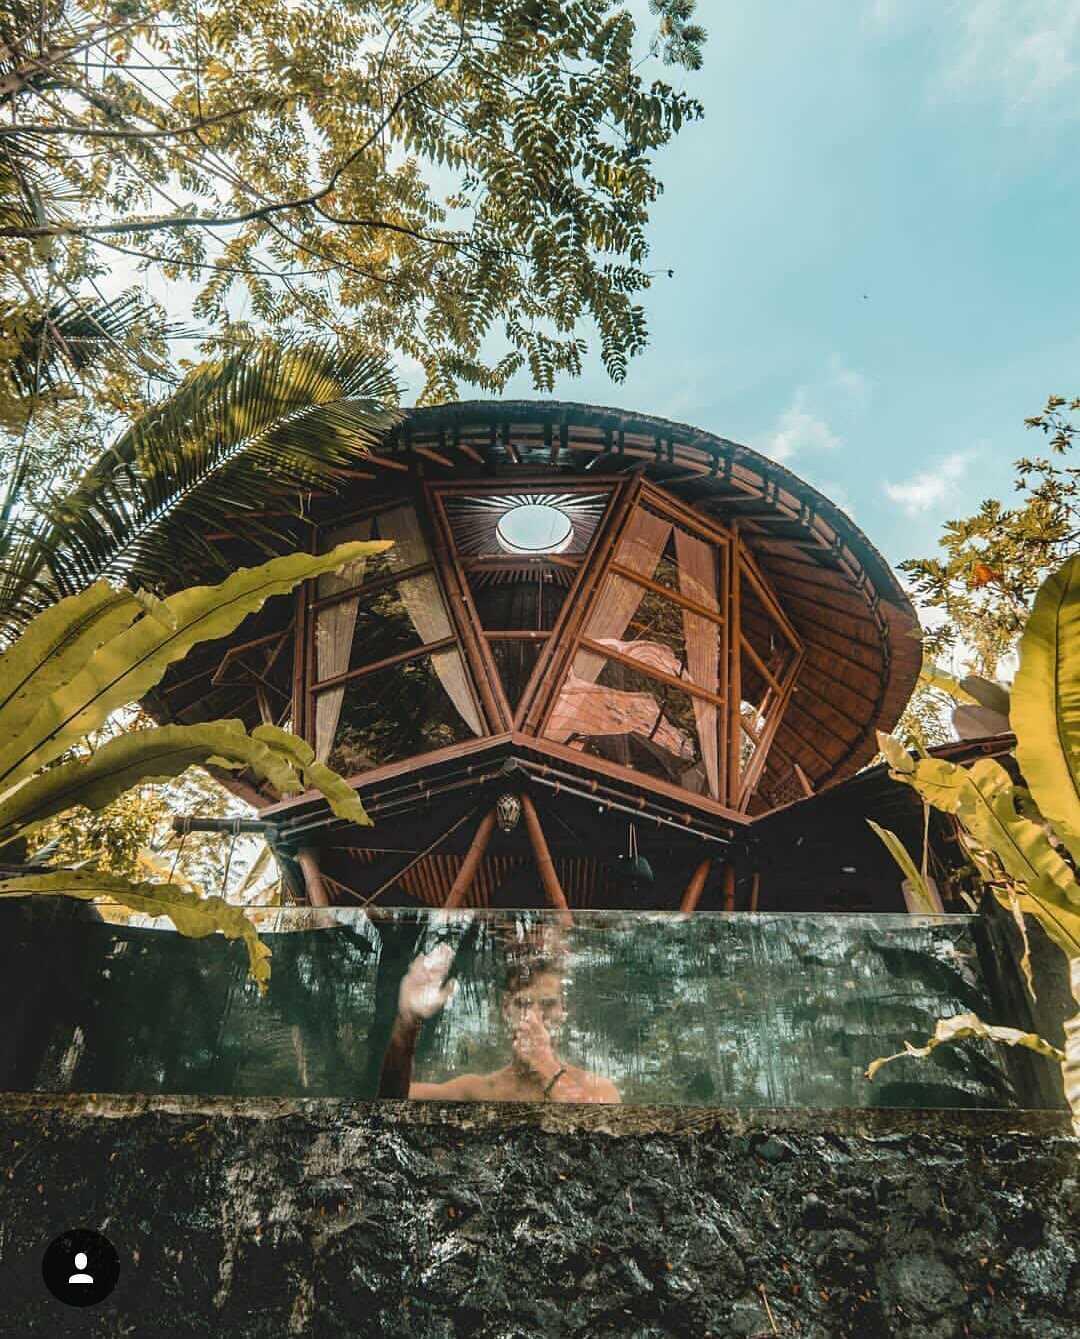 Studio Wna Hideout Beehive Glamping. Bali. Indonesia Selat, Kabupaten Karangasem, Bali, Indonesia Selat, Kabupaten Karangasem, Bali, Indonesia Studio-Wna-Hideout-Beehive-Glamping-Bali-Indonesia  <P>Overflow Plunge Pool With Glass Border</p> 63115